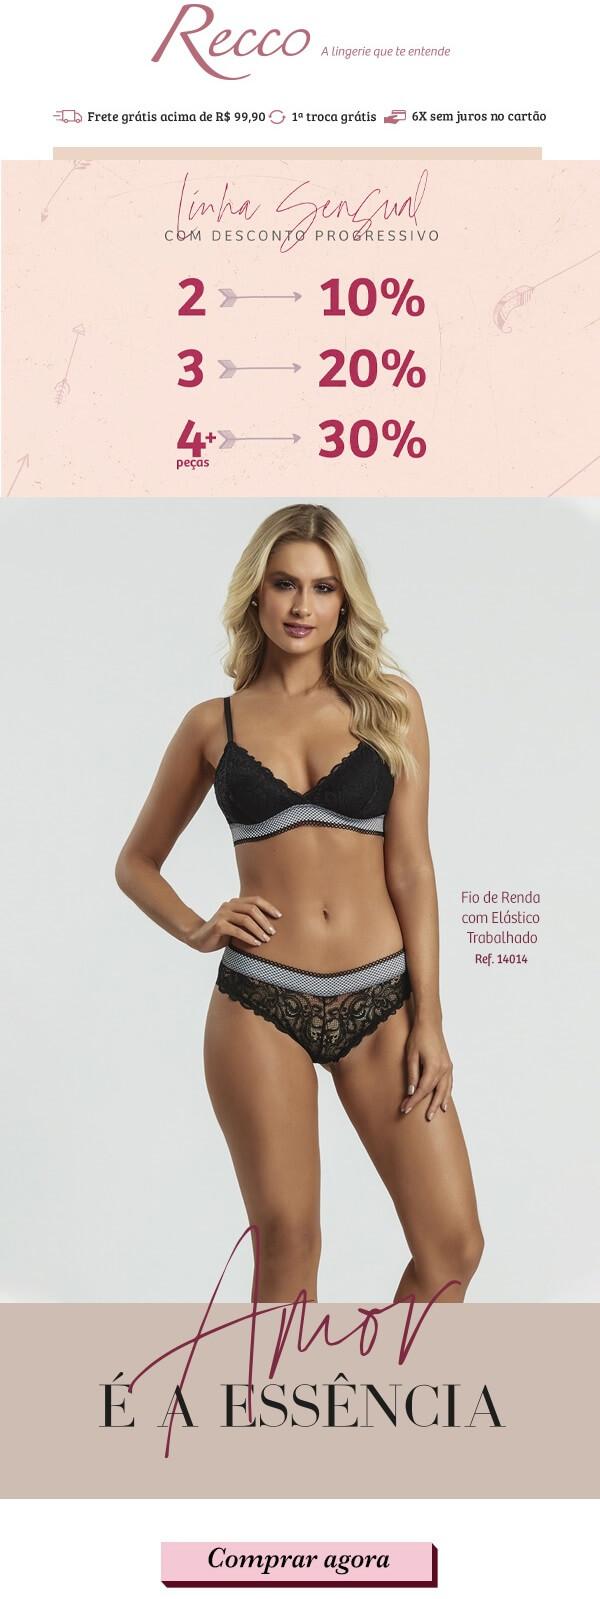 recco-lingerie